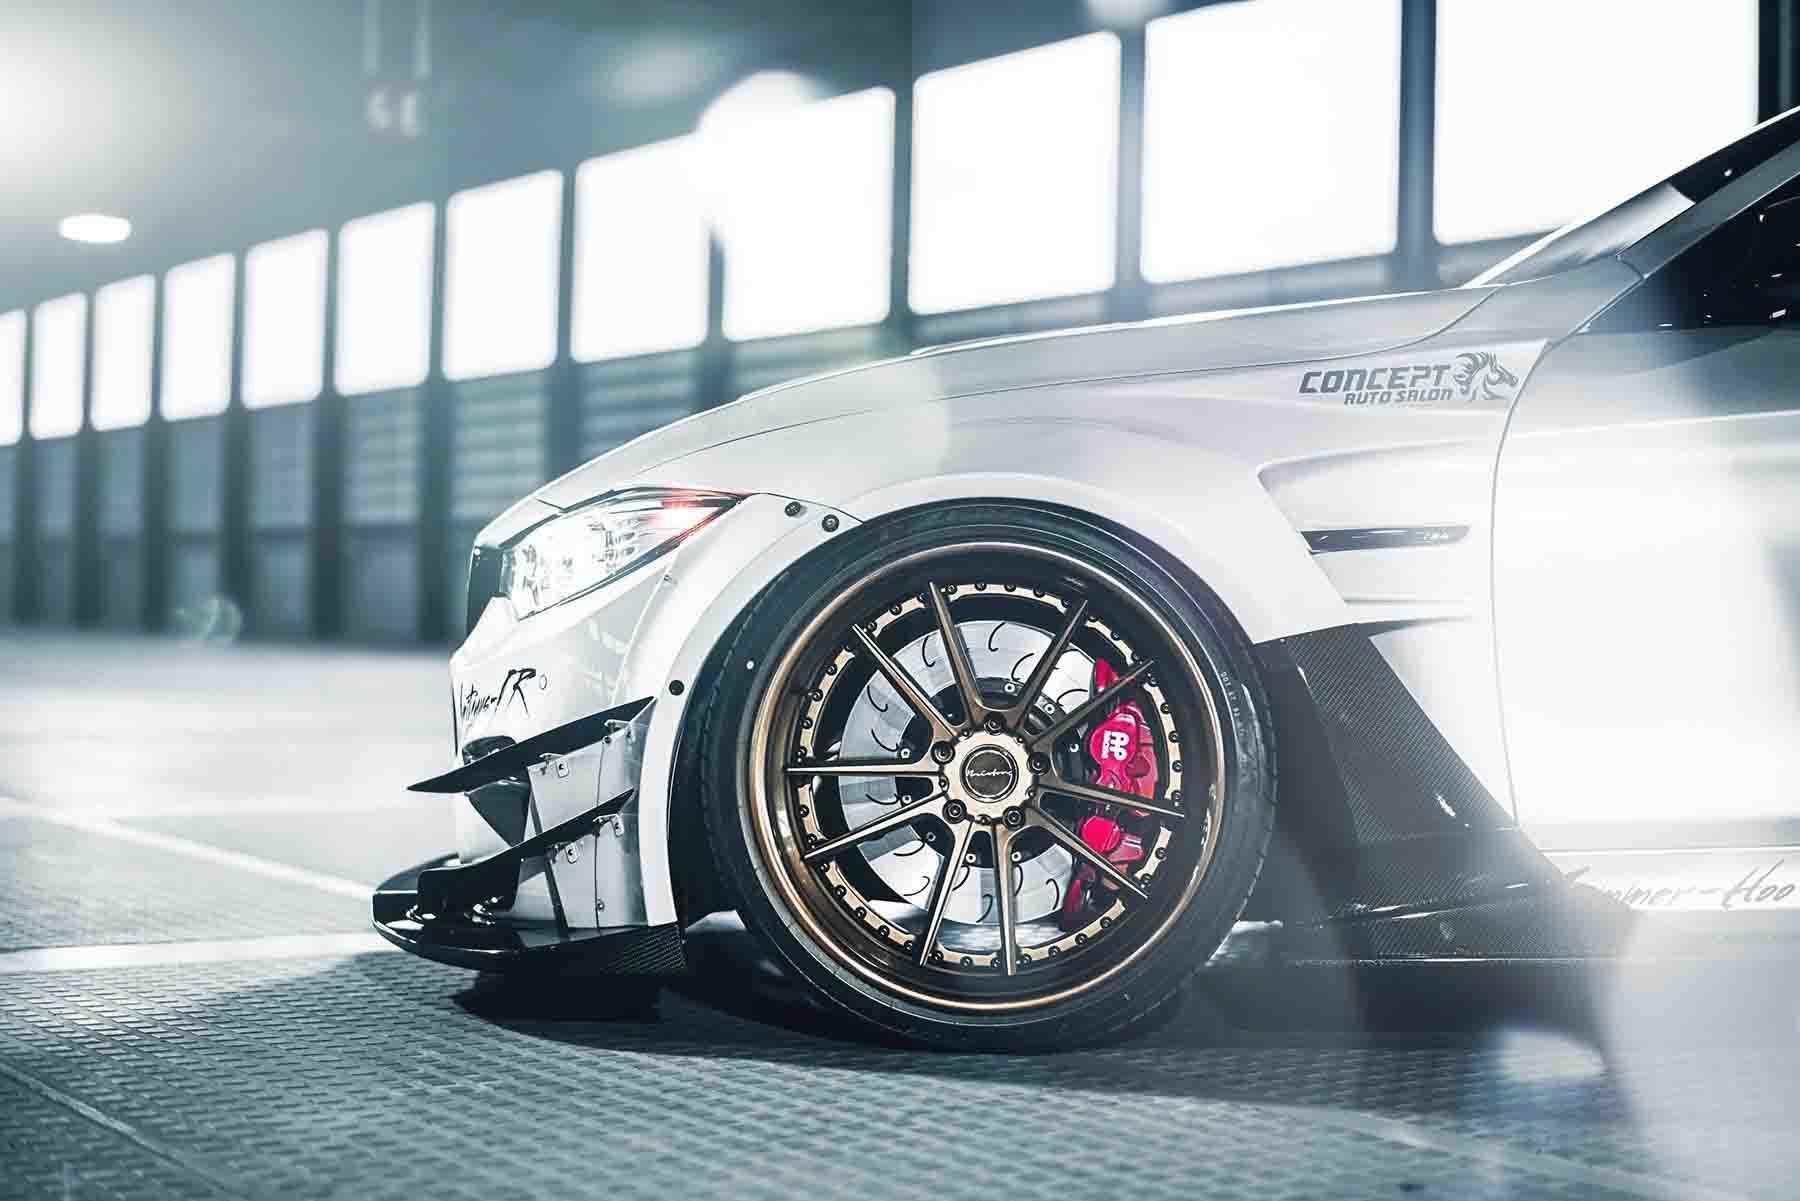 images-products-1-2192-232974480-brixton-forged-m51-targa-series-forged-wheels-varis-bmw-f82-m4-white-bronze-wheels-1800x1201.jpg